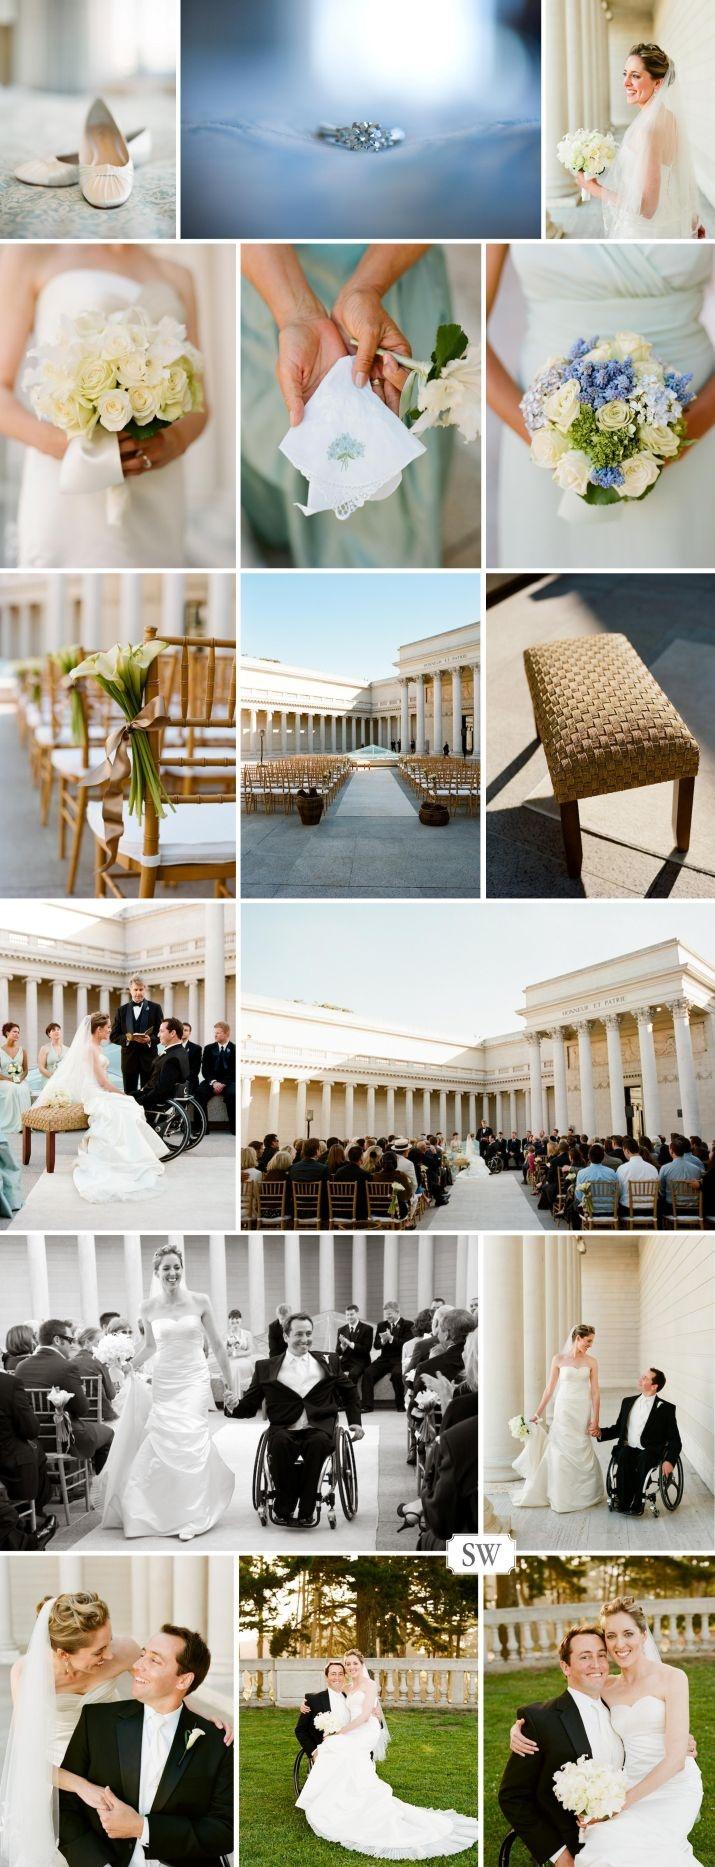 Legion of Honor Wedding Photo by Lisa